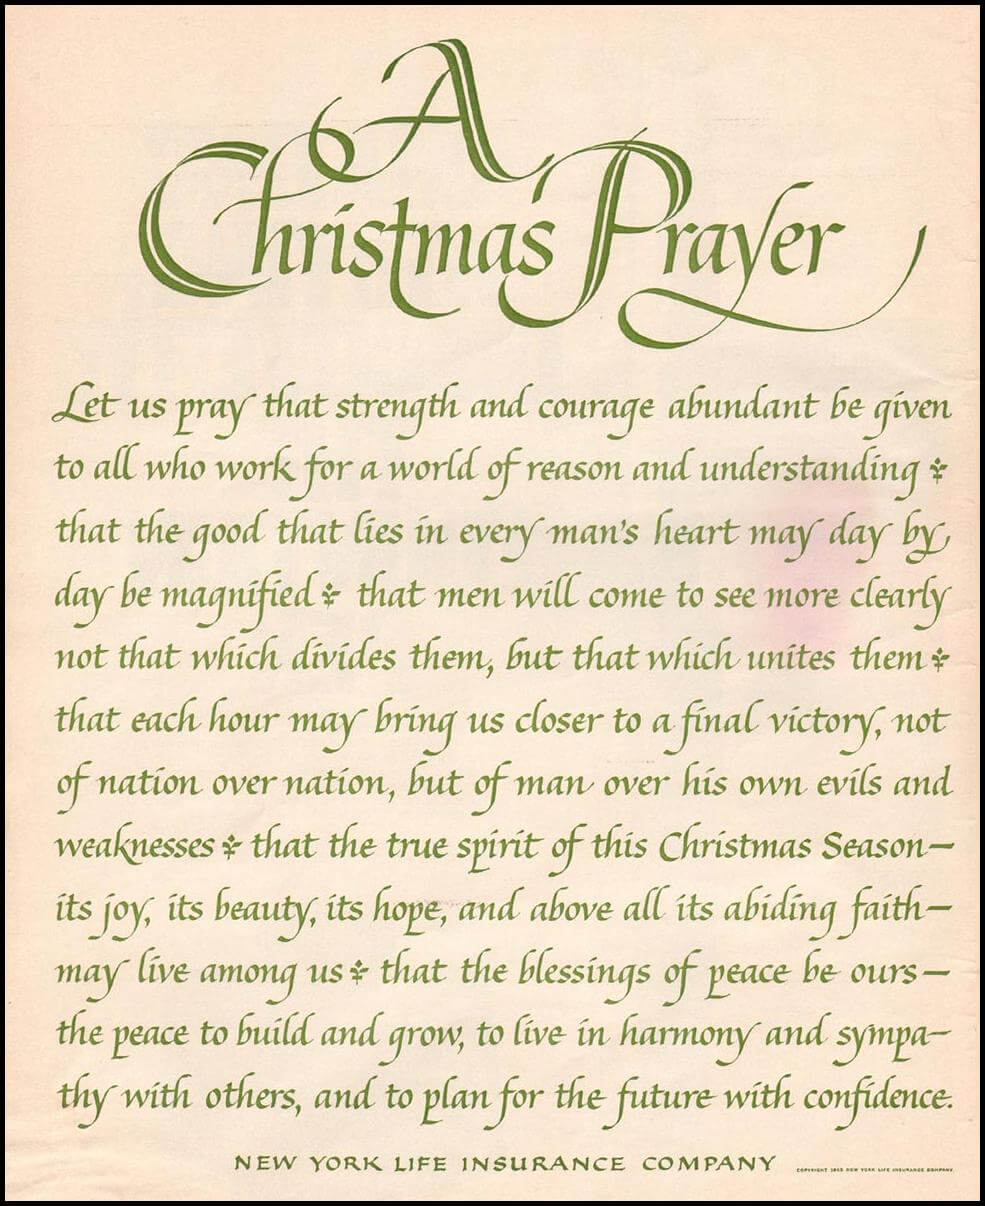 Best Christmas Prayer